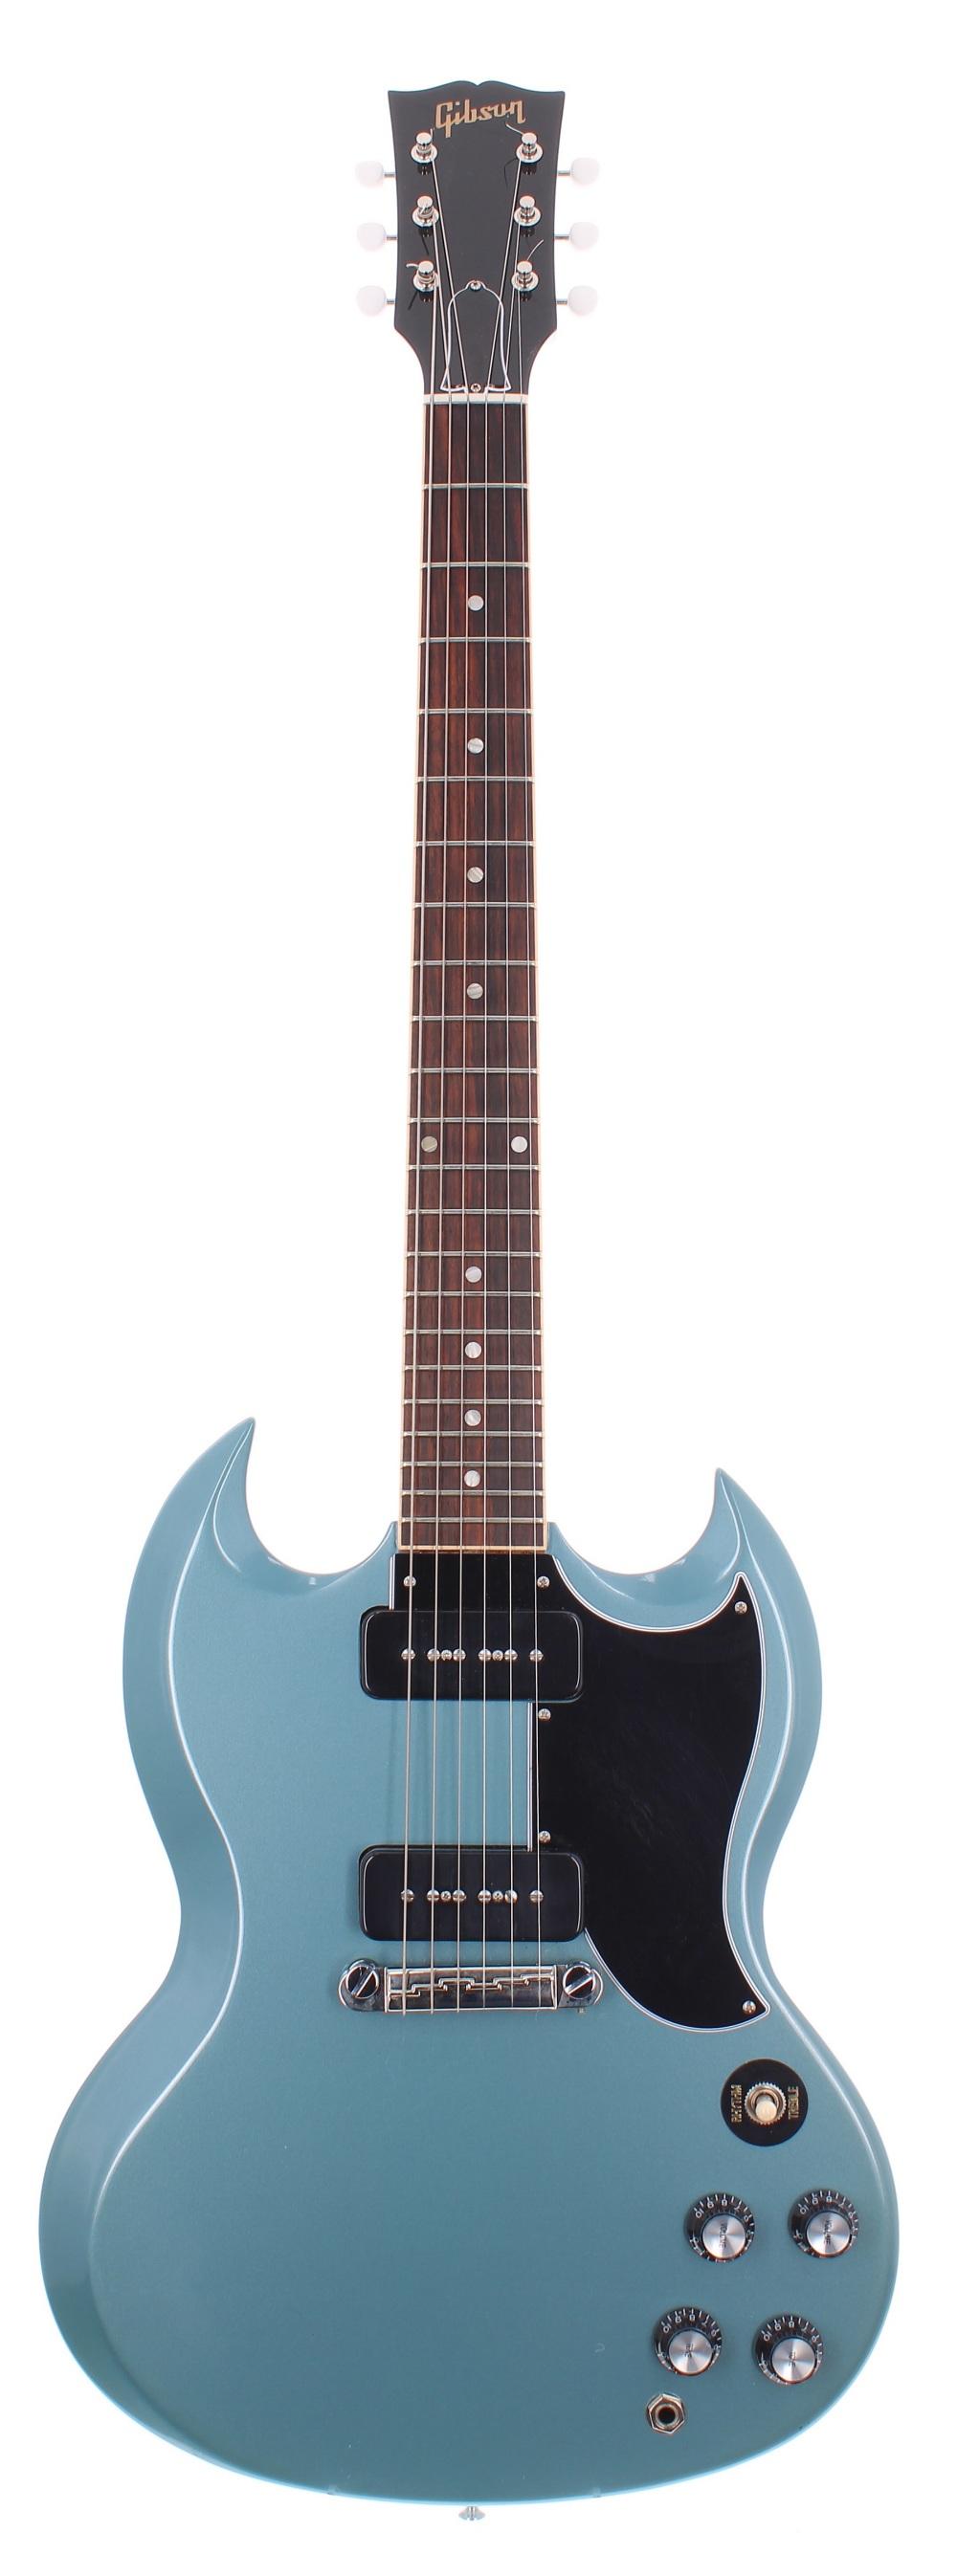 2019 Gibson SG Special electric guitar, made in USA, ser. no. 1xxx9xxx4; Finish: Pelham blue;